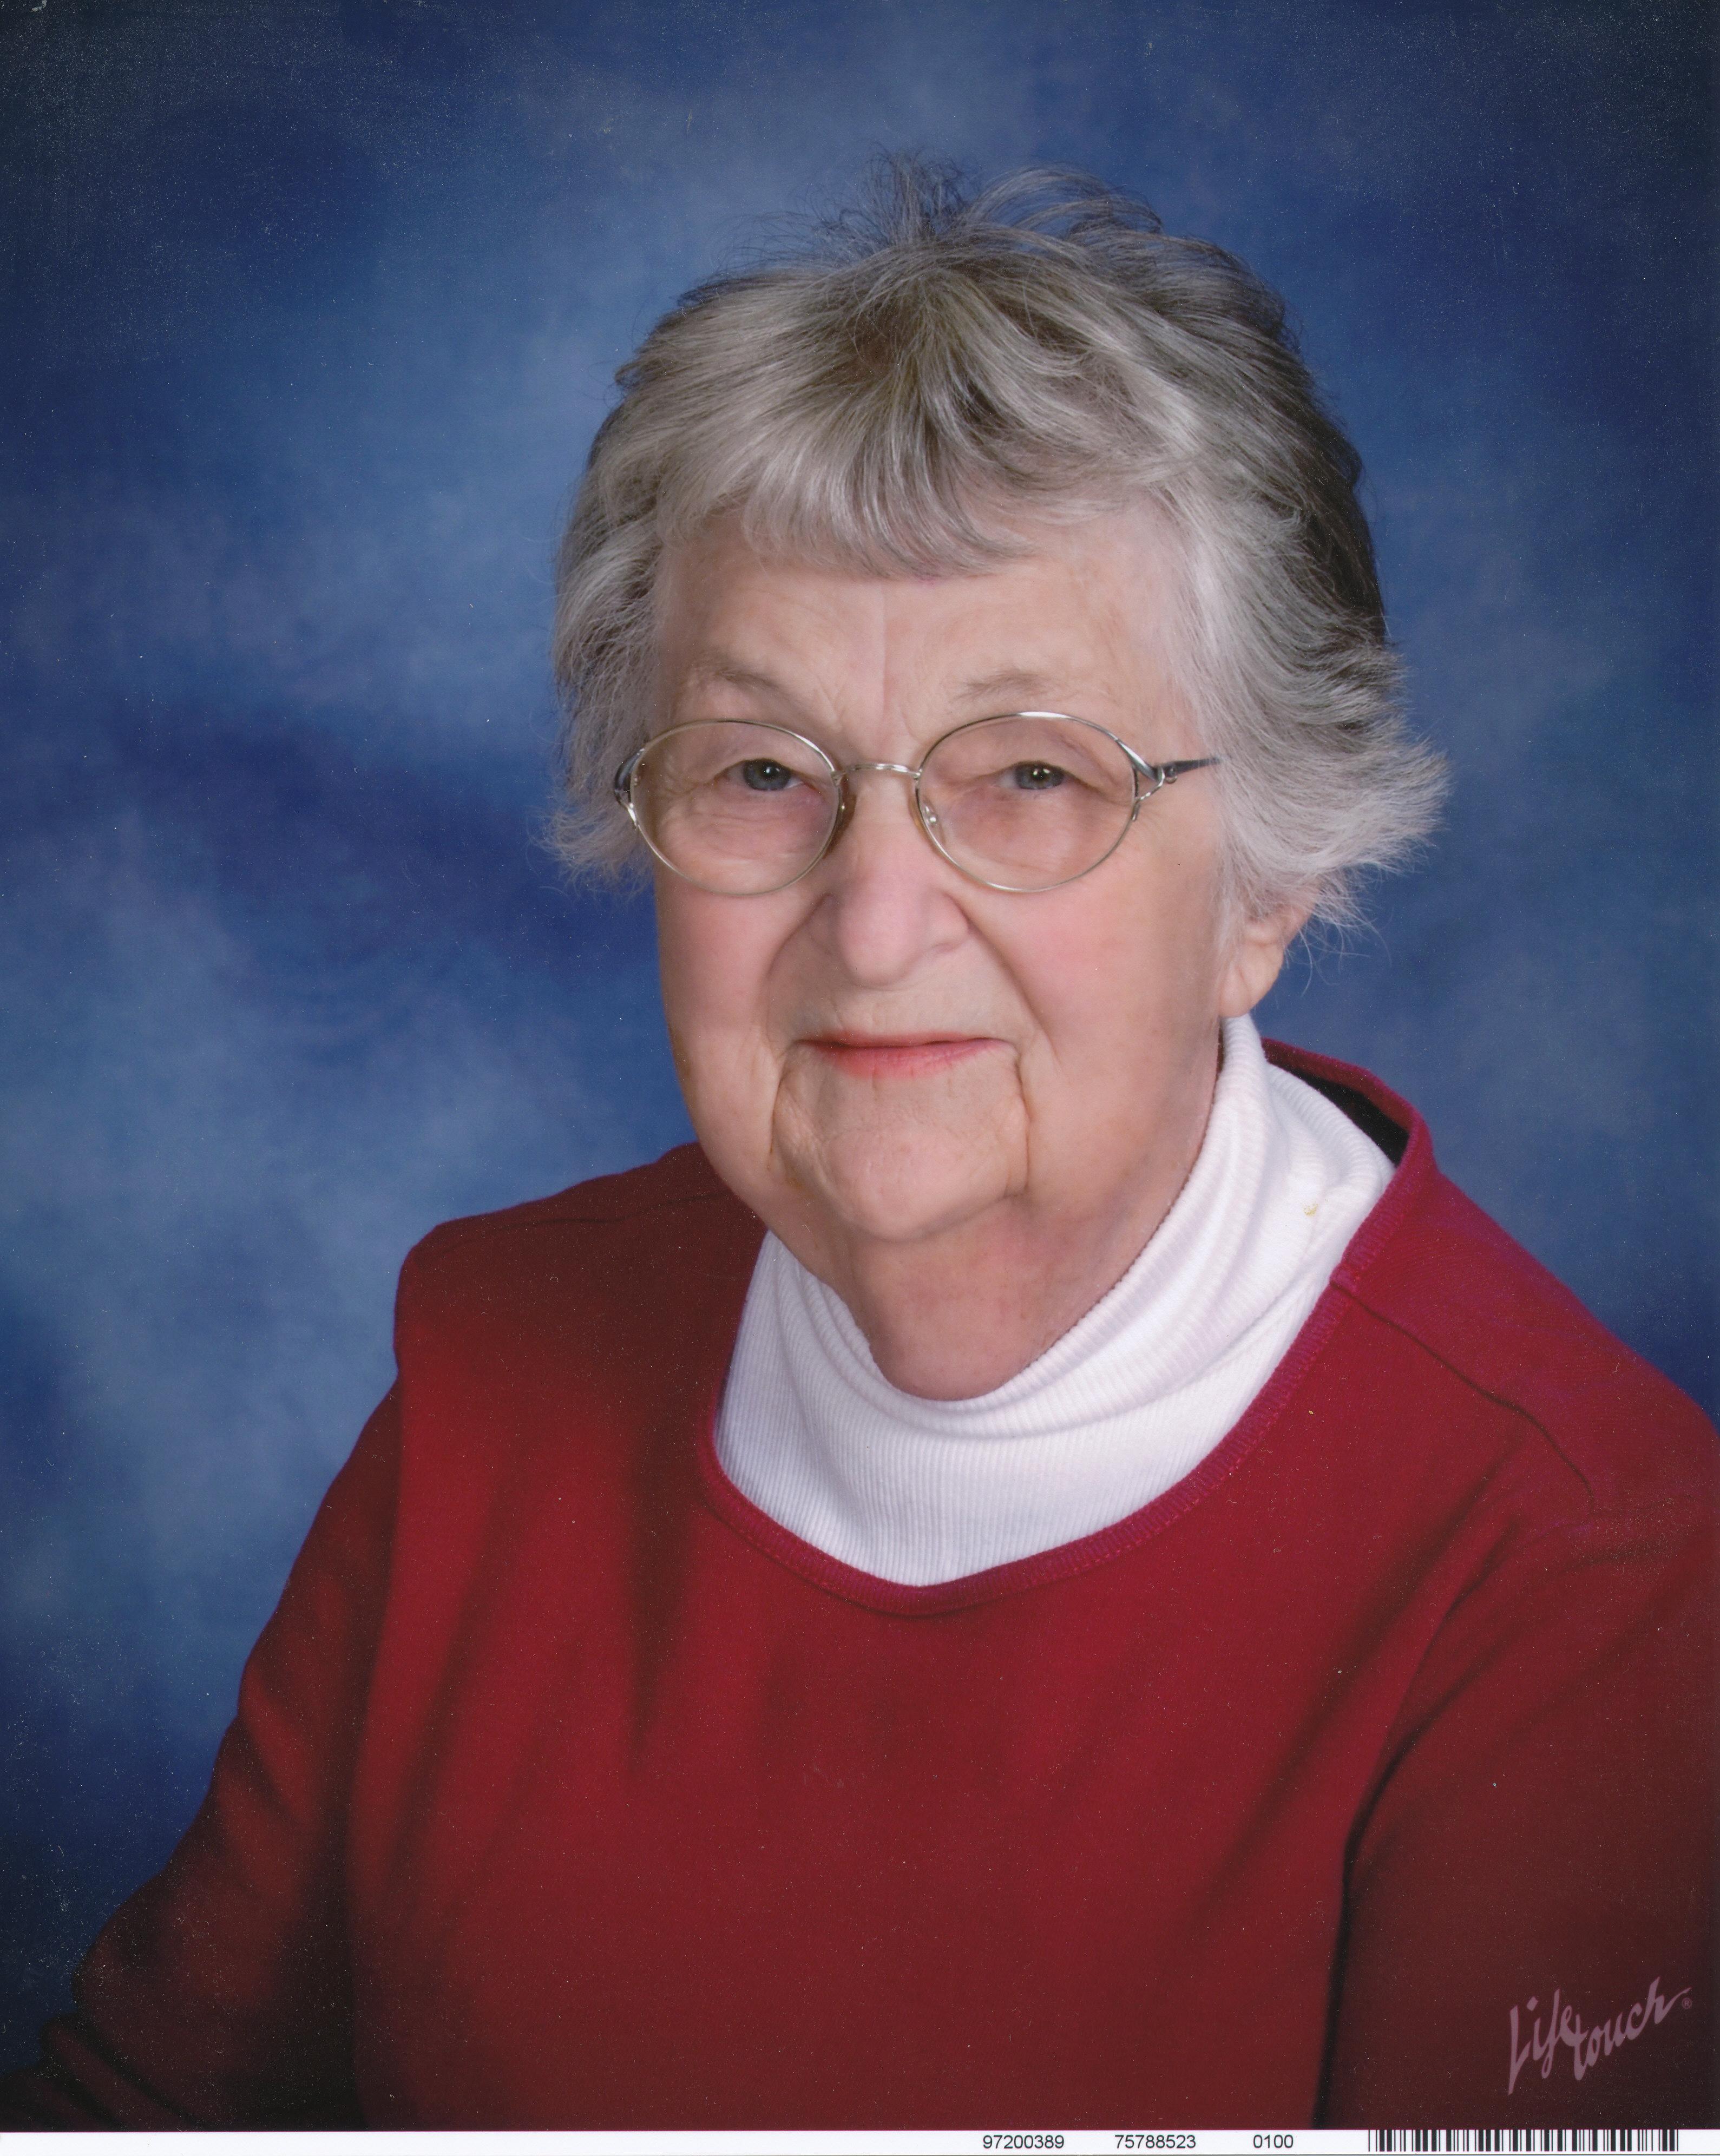 Eleanor Foust, age 86, of Stanton, NE formerly of West Point, NE